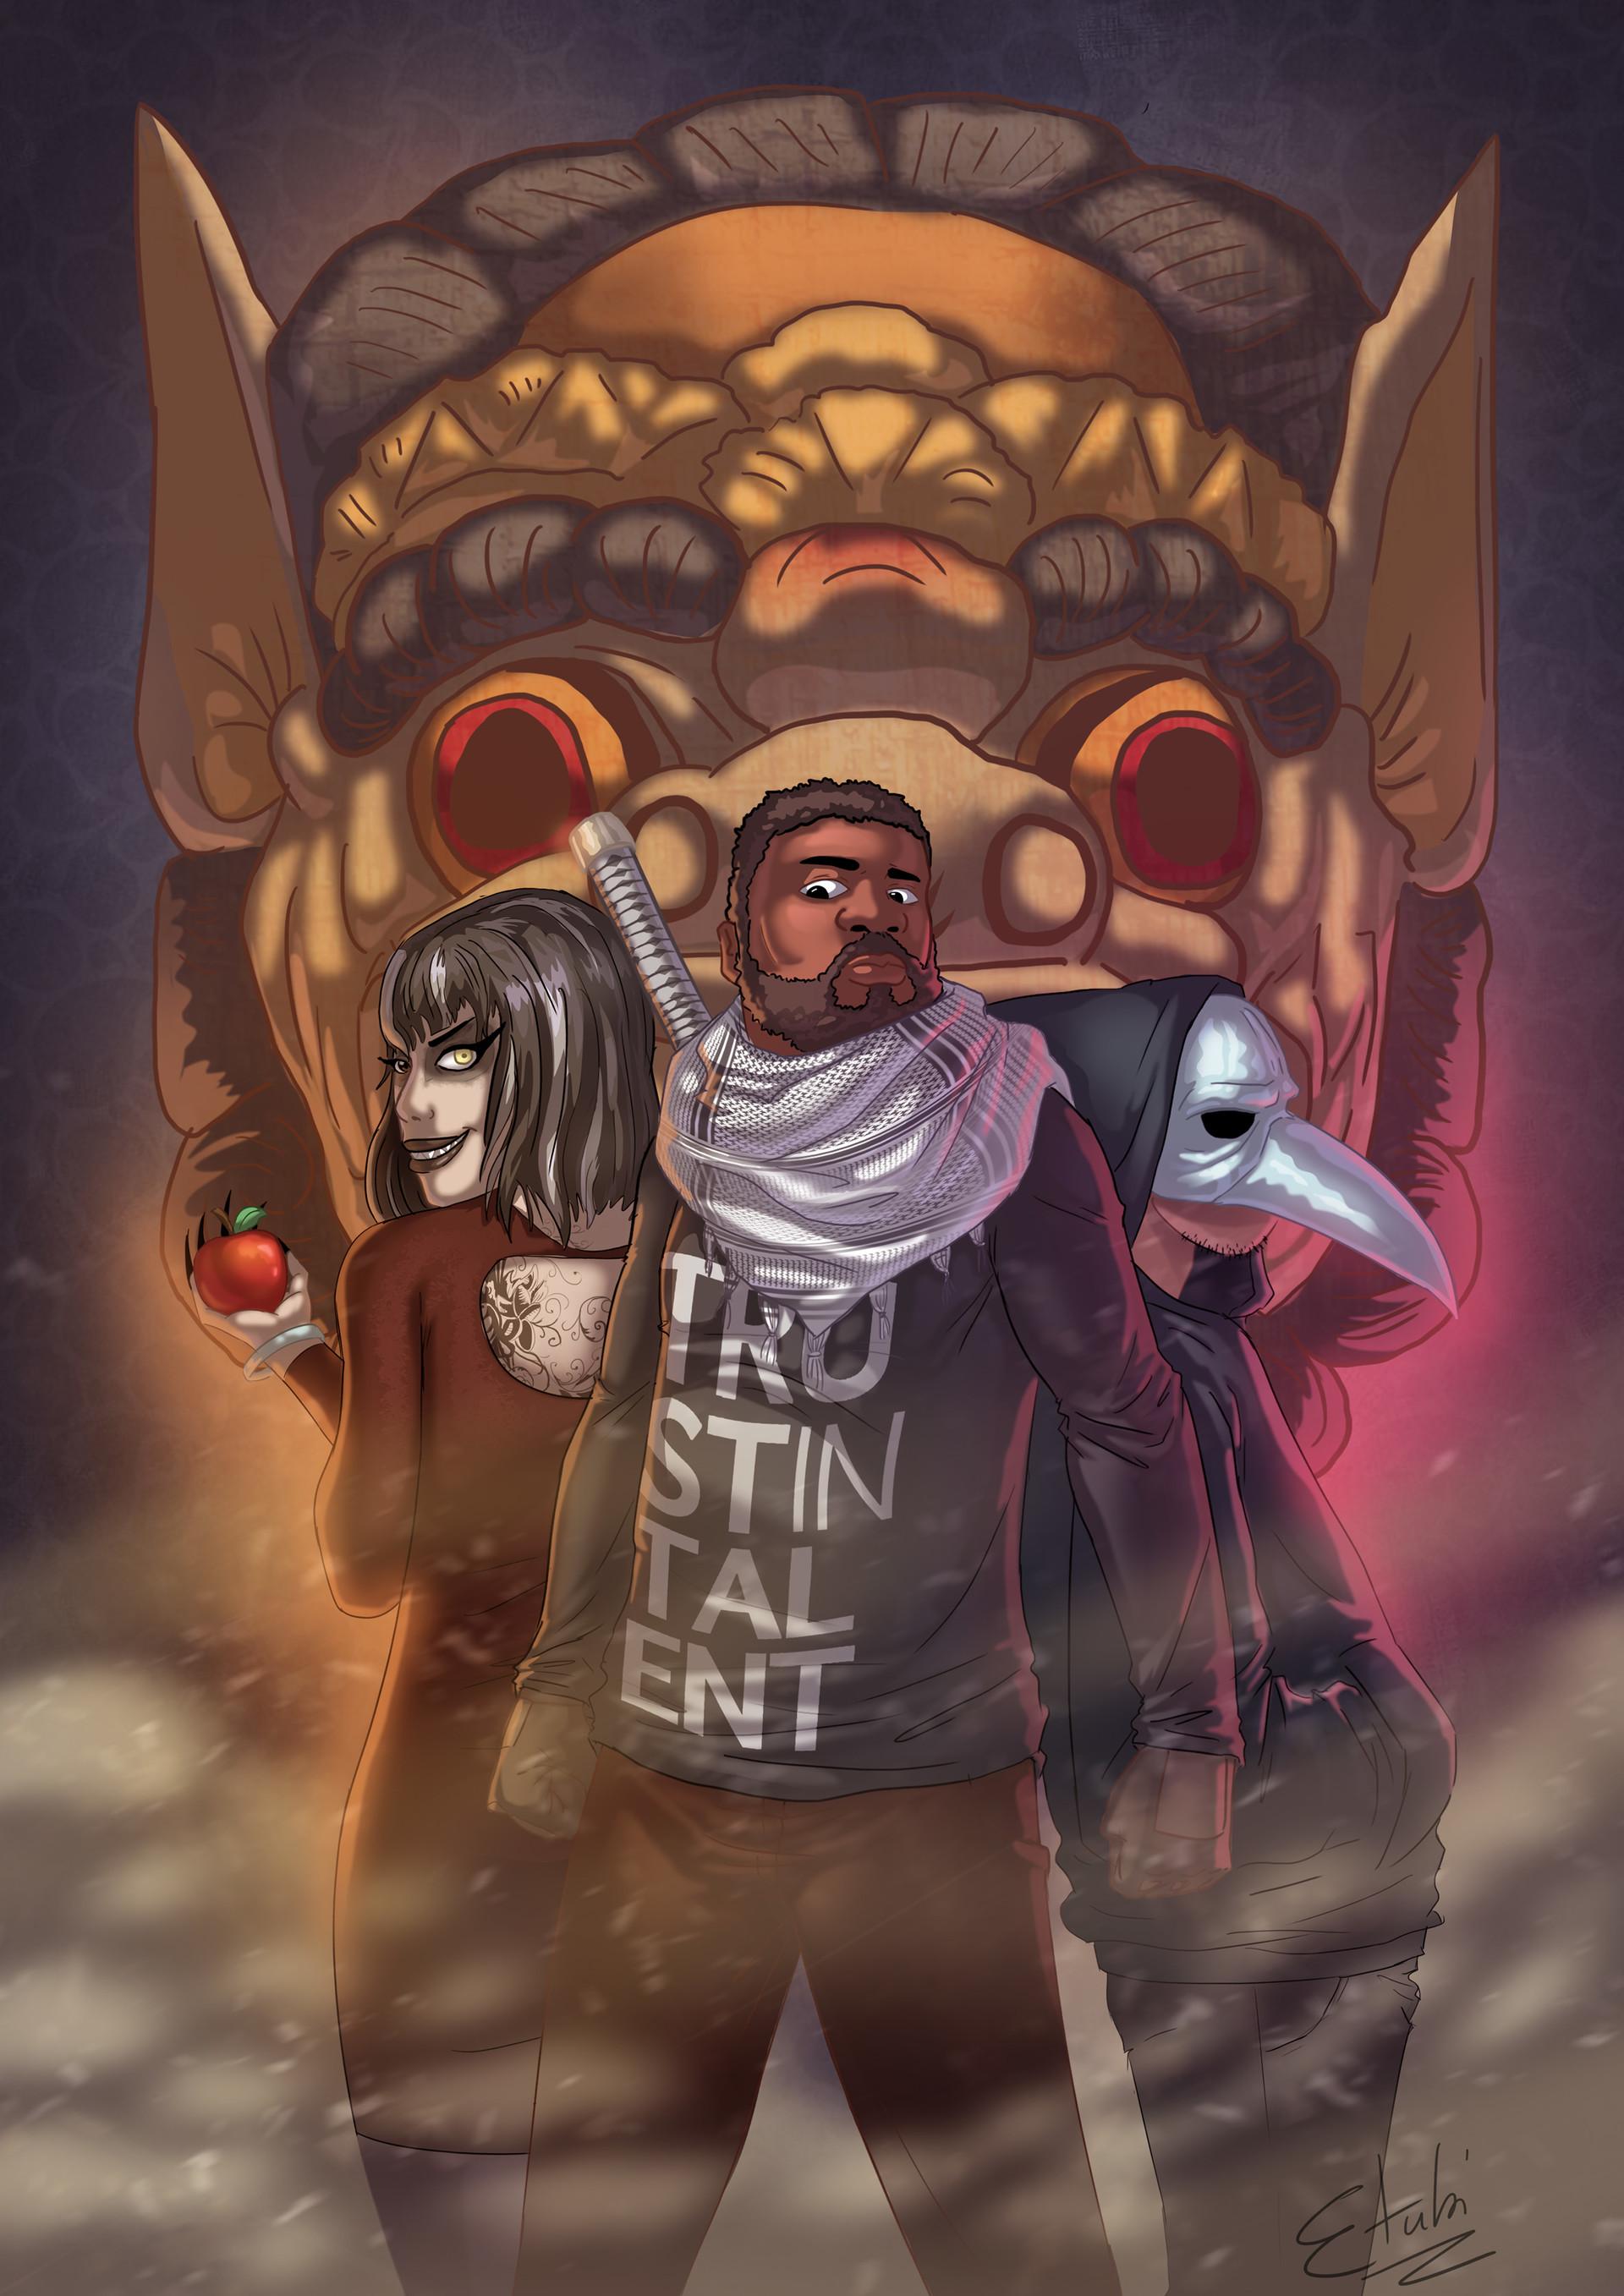 Etubi onucheyo illustration for nmd a3